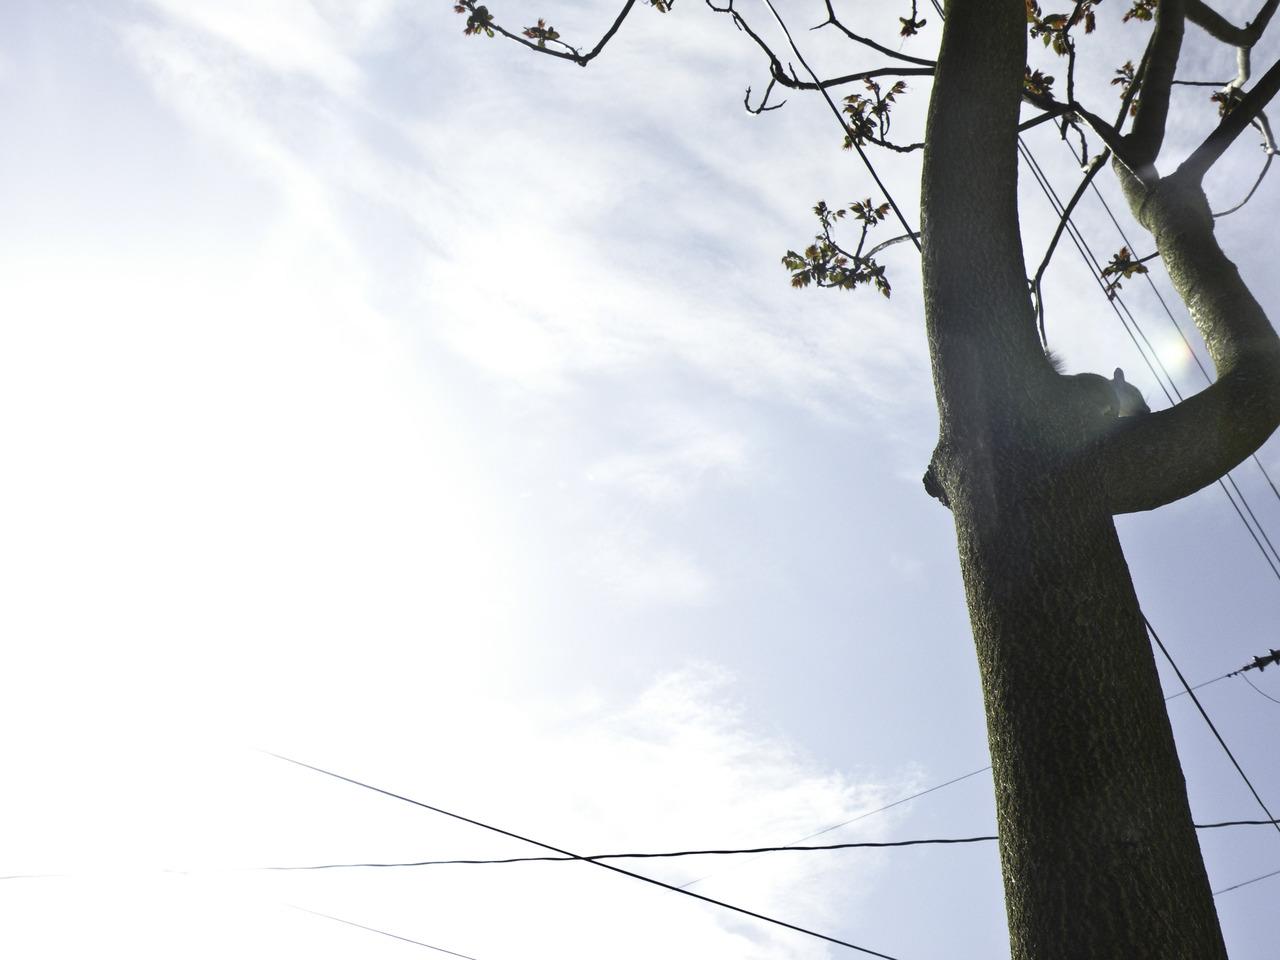 friendly squirrel in a tree